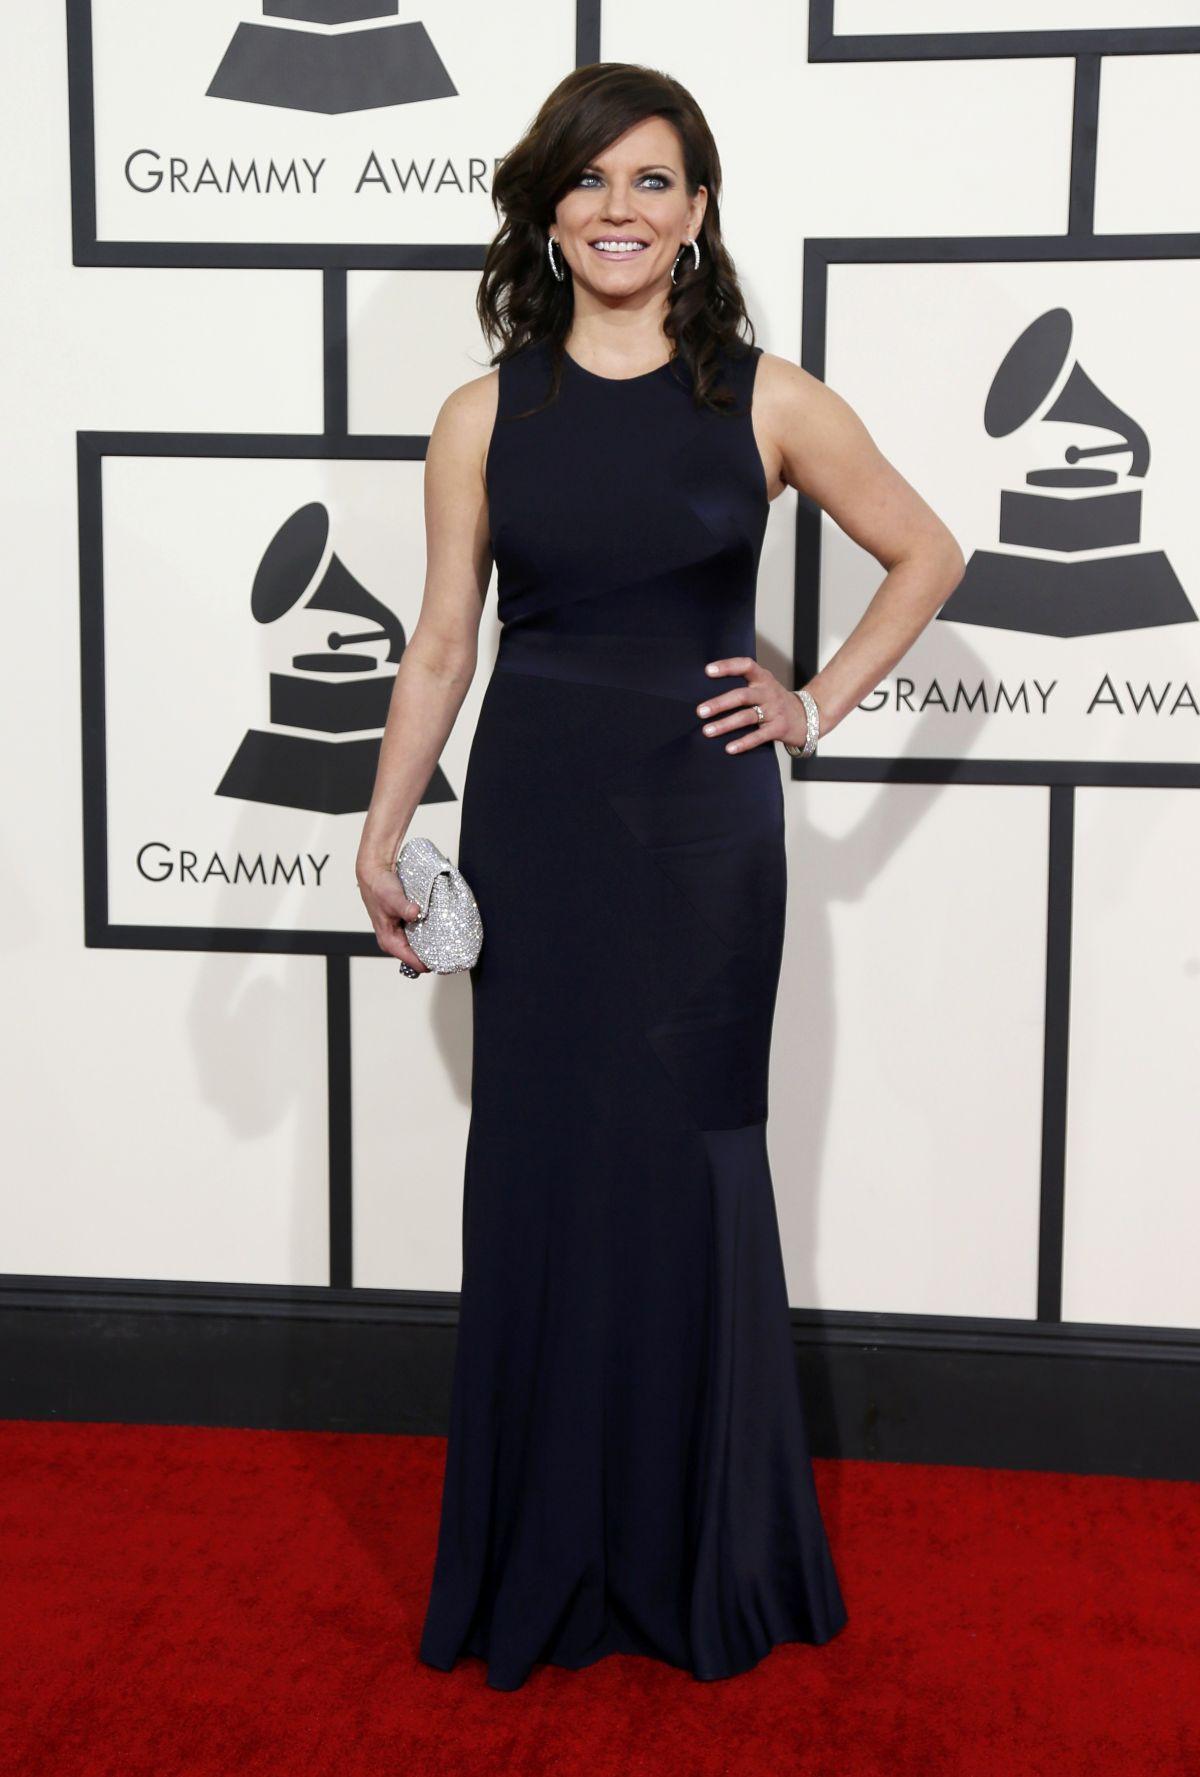 MARTINA MCBRIDE at 2014 Grammy Awards in Los Angeles